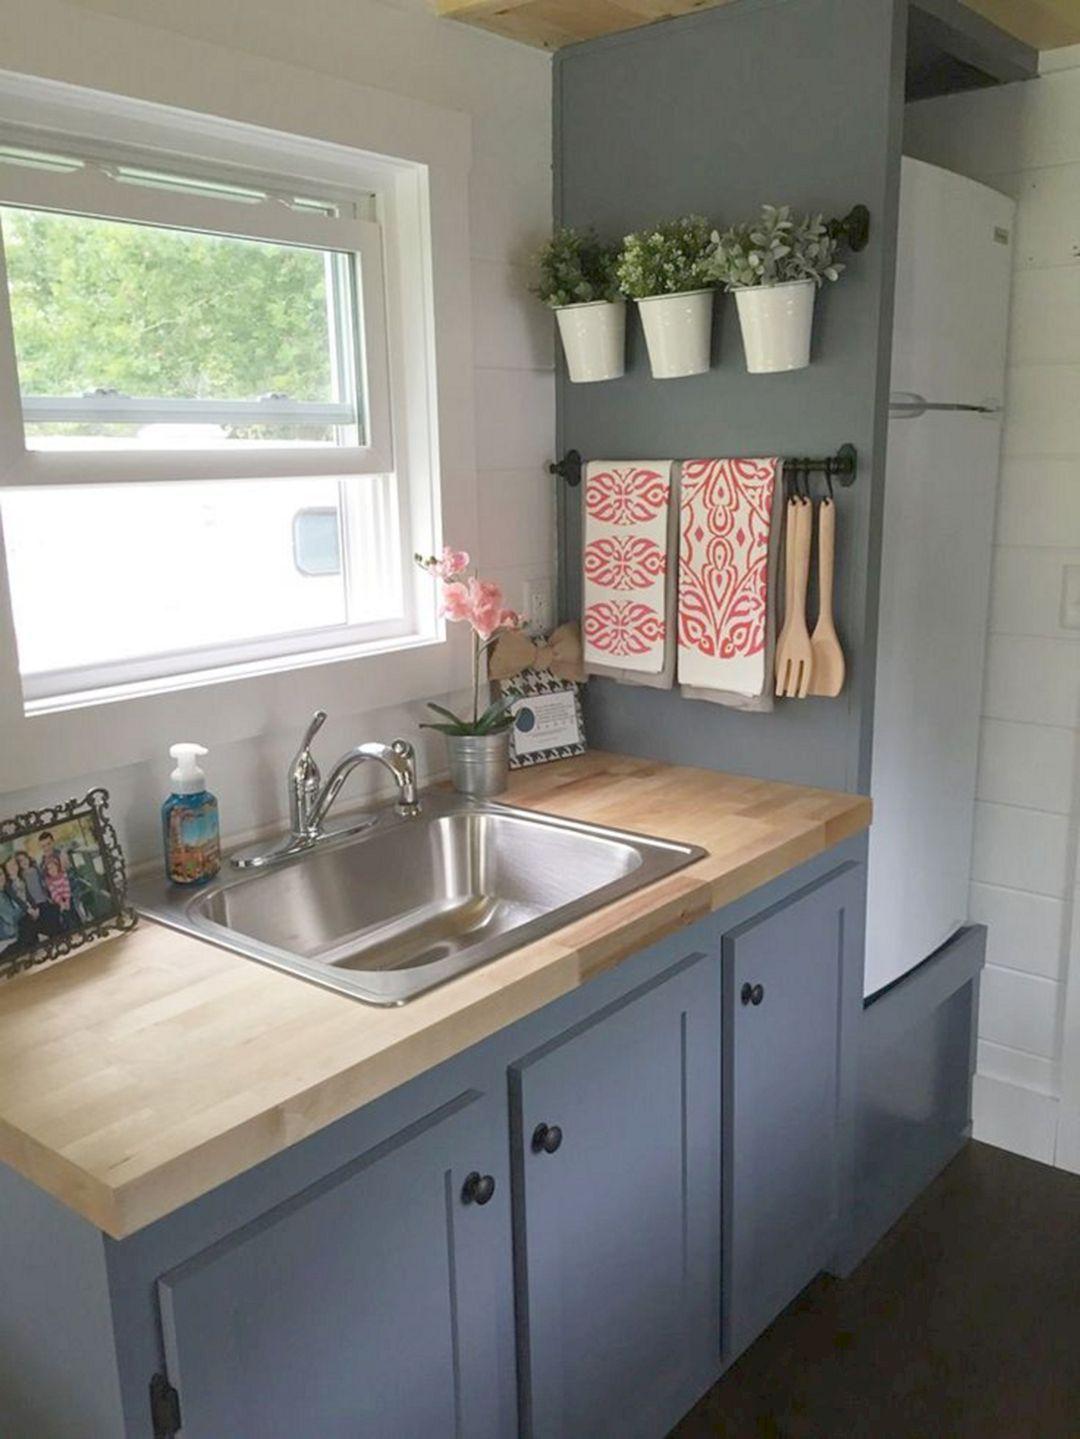 Breathtaking 45 Best Charming Mini Kitchen Design Ideas For Inspiration Https Usdecorating Com Kitchen Design Small Small Kitchen Decor Kitchen Remodel Small